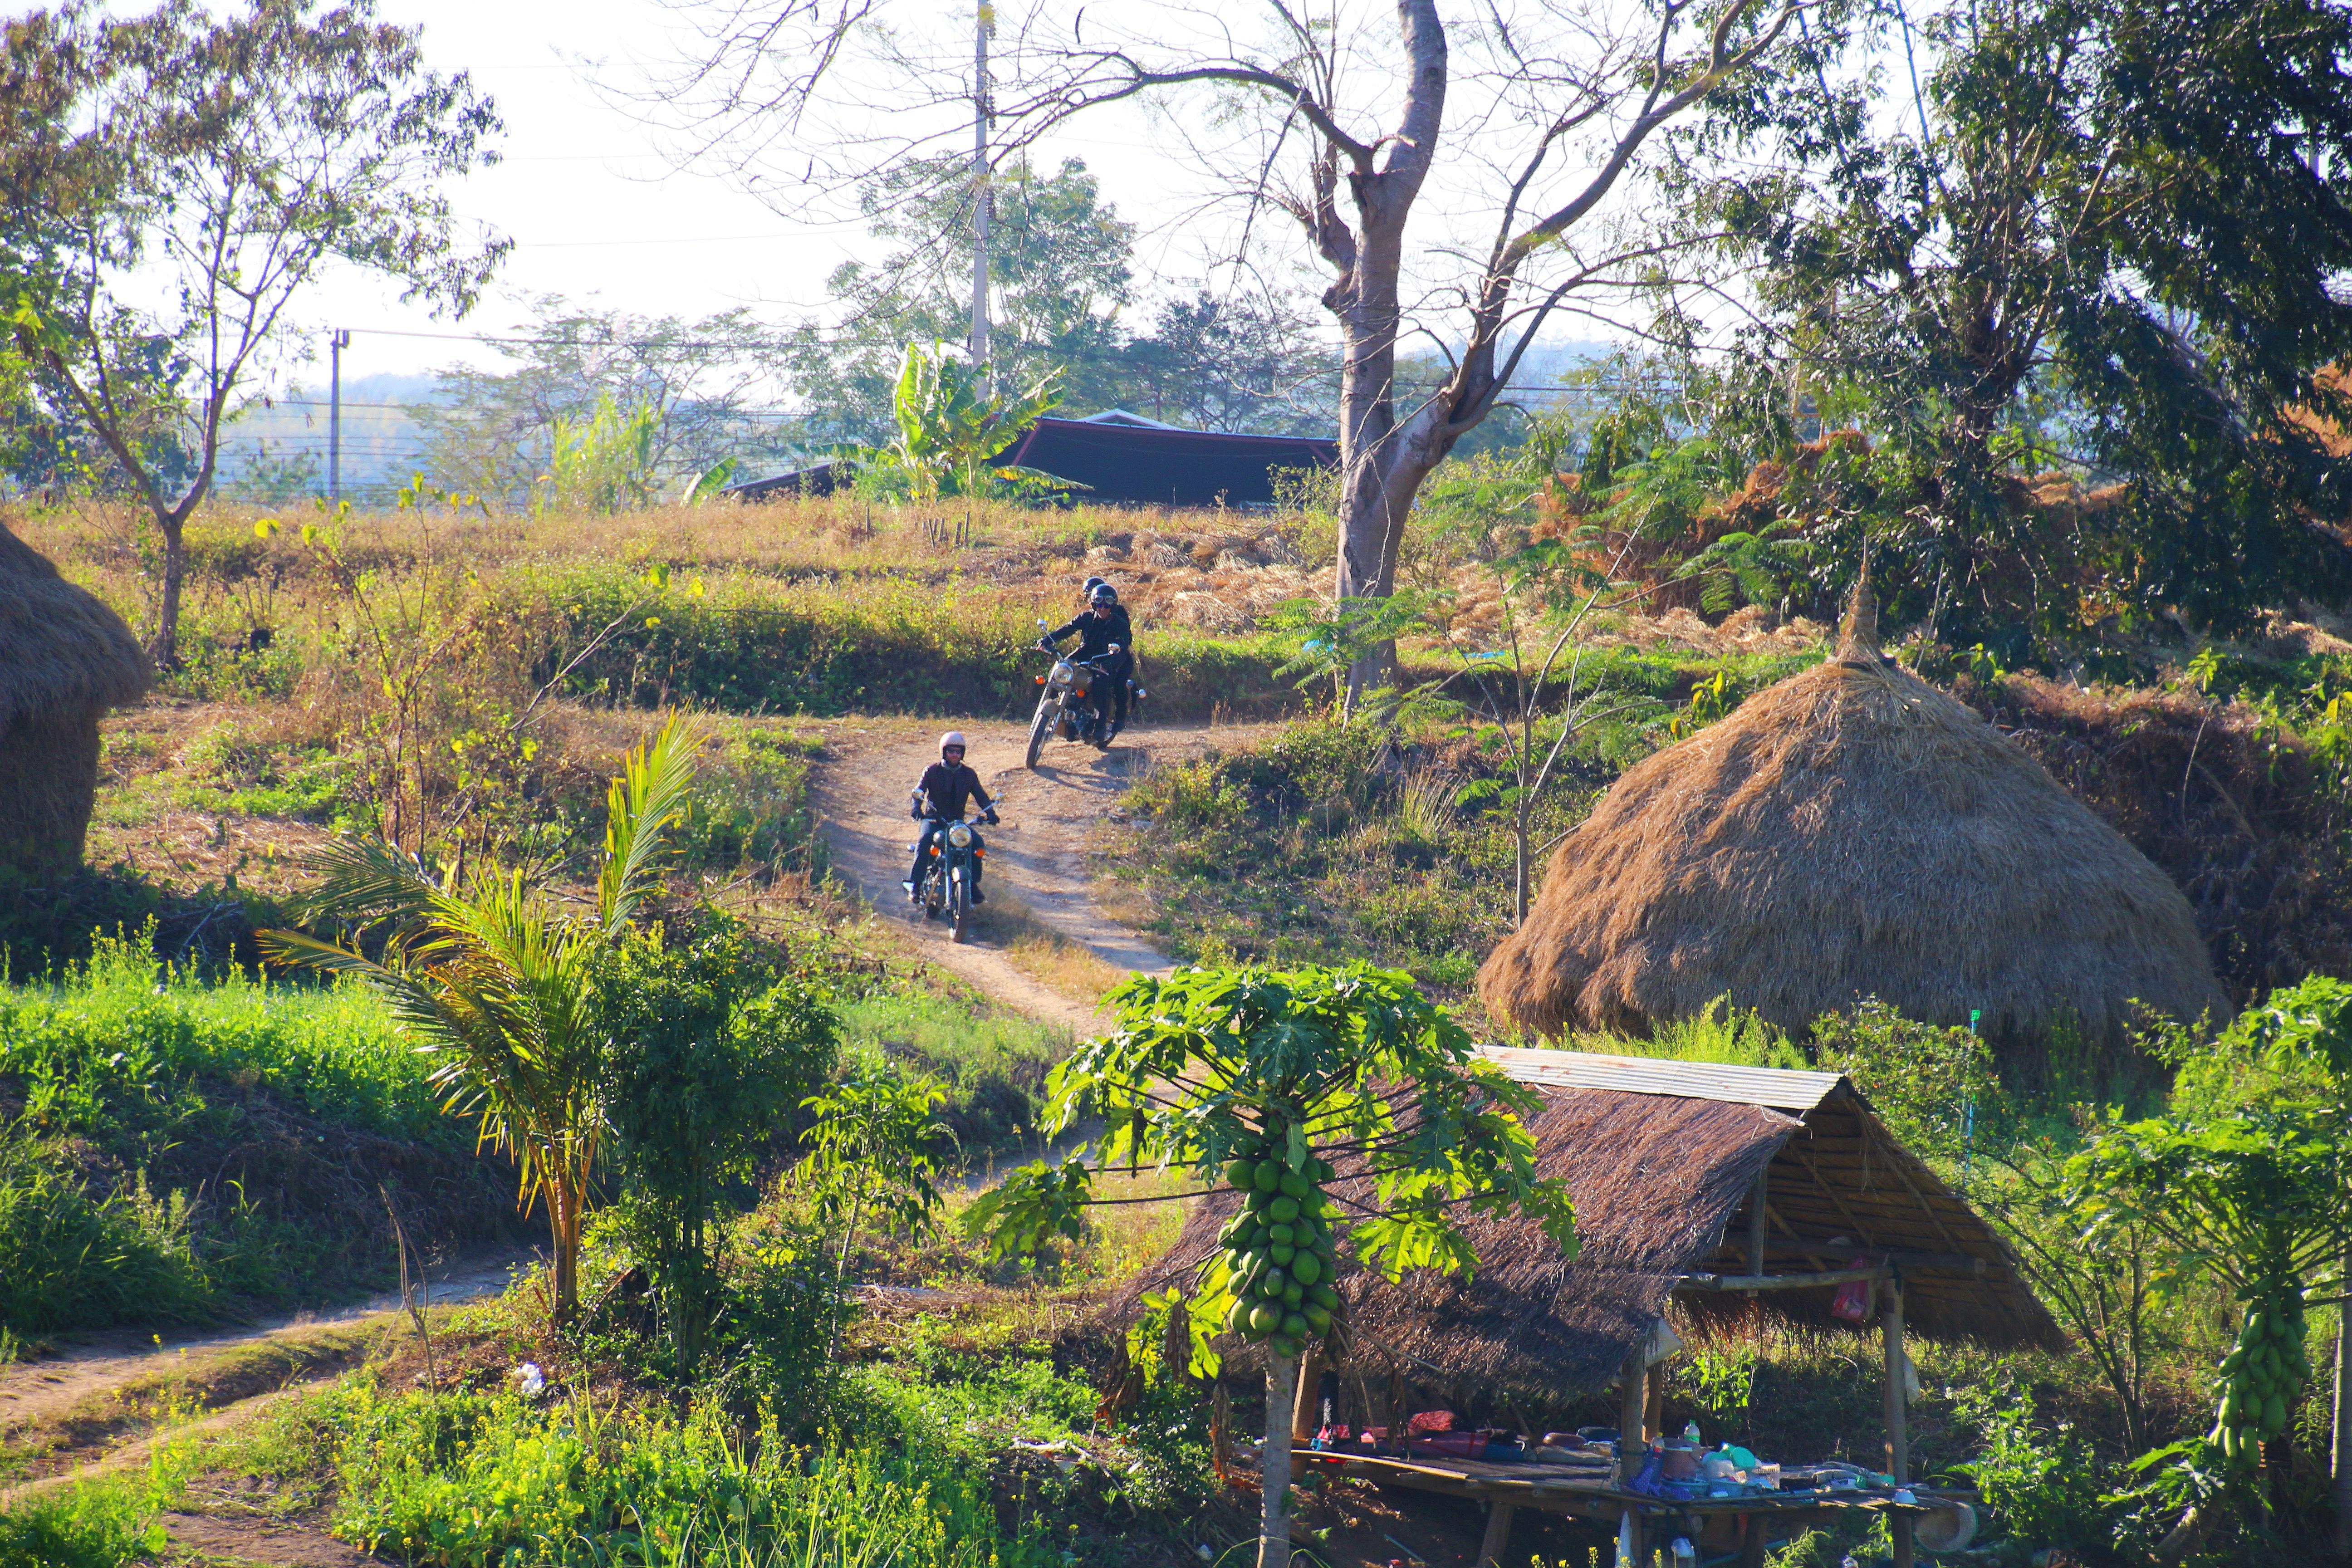 Motorcycle road trip Thailand & Laos - On the Edge of Siam Kingdom